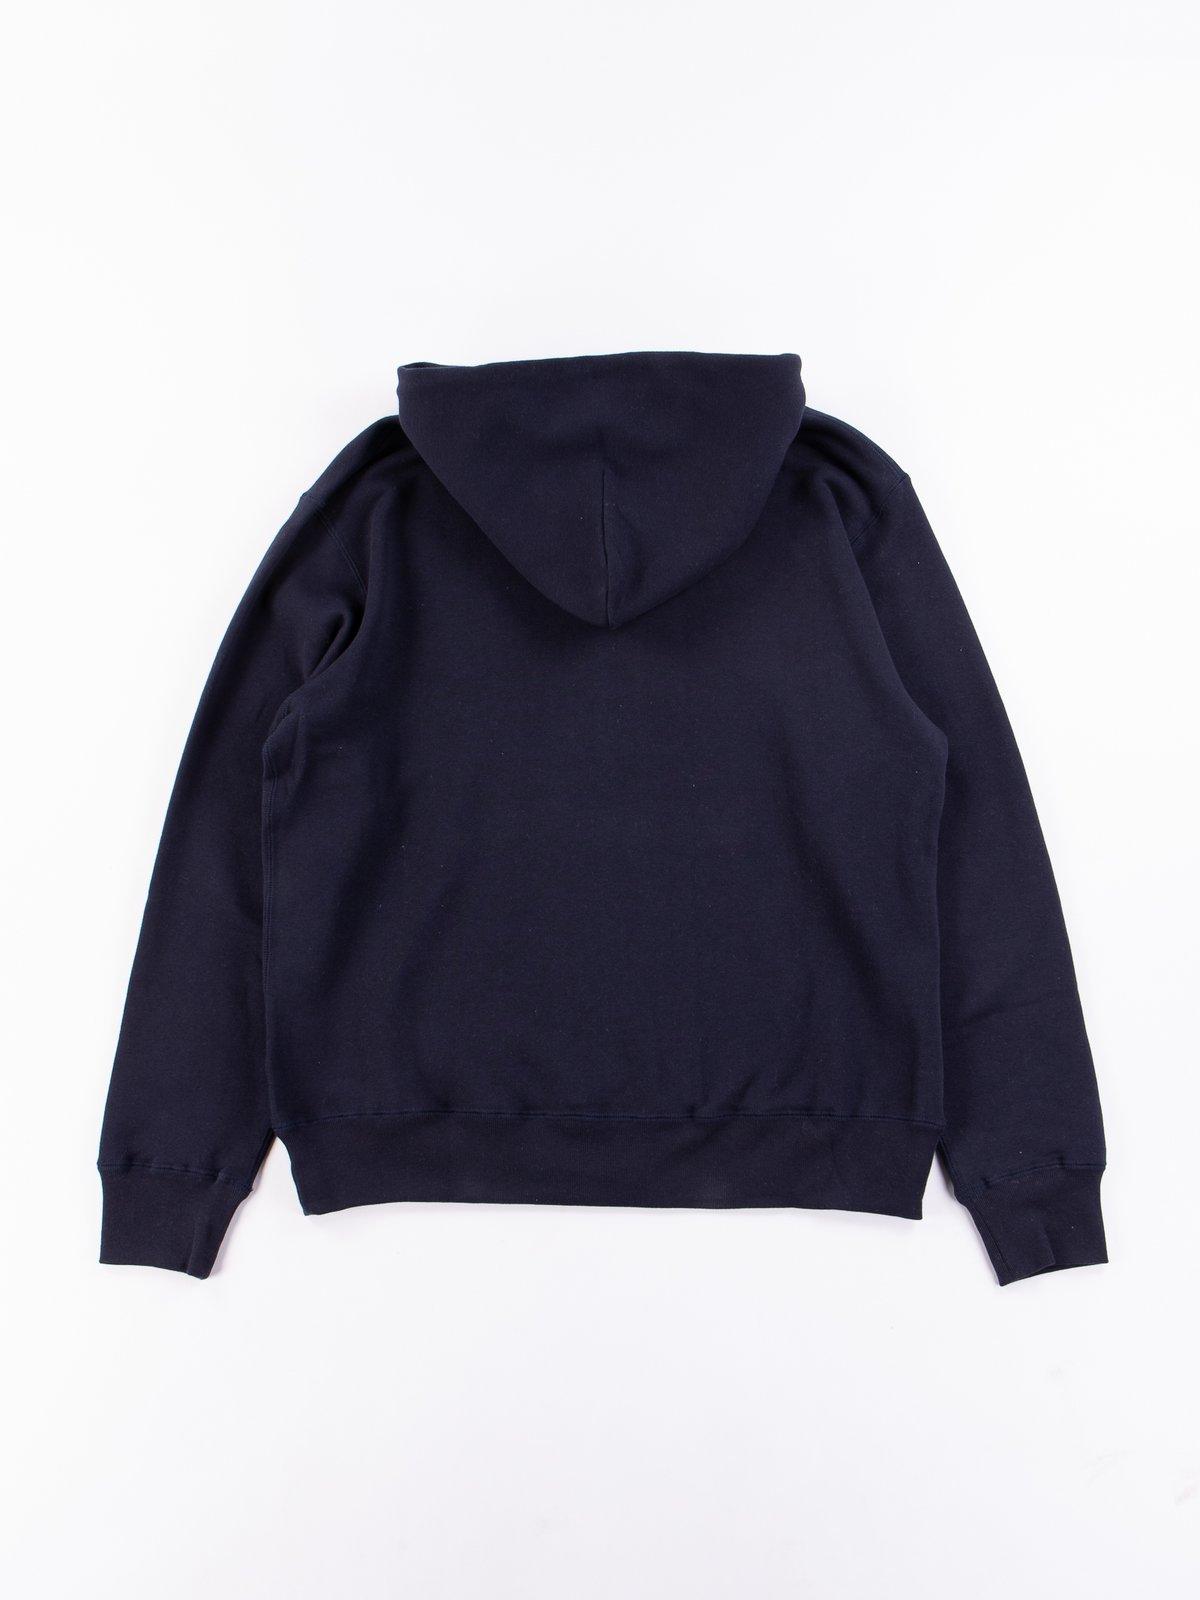 Navy Pullover Hoodie - Image 4